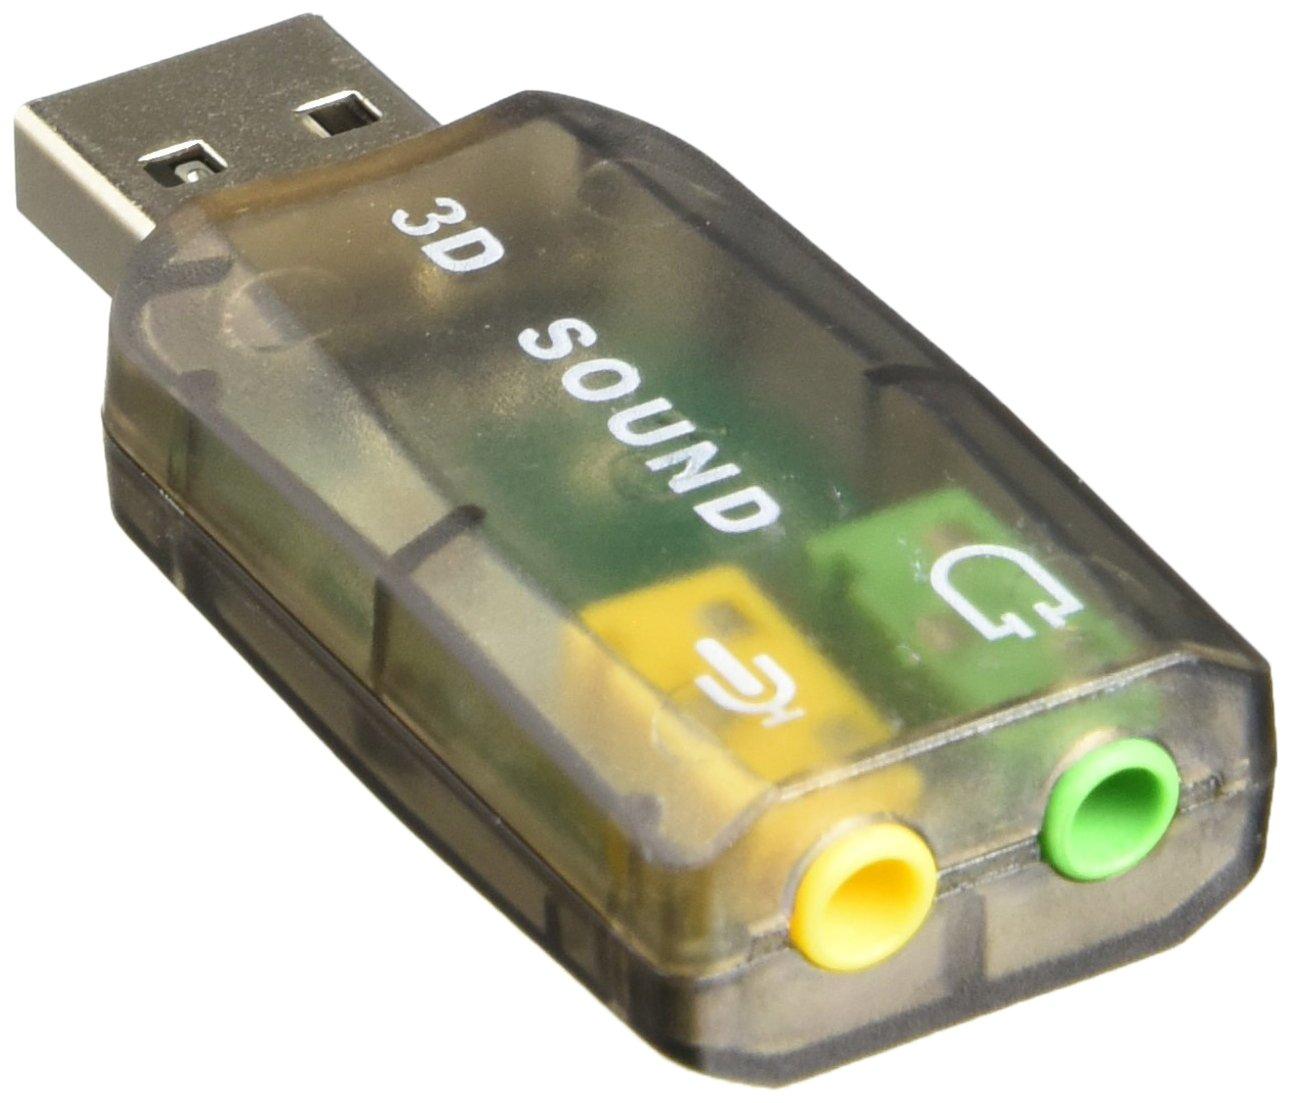 Amazon.com: Tarjeta de sonido USB externo para portátil para ...